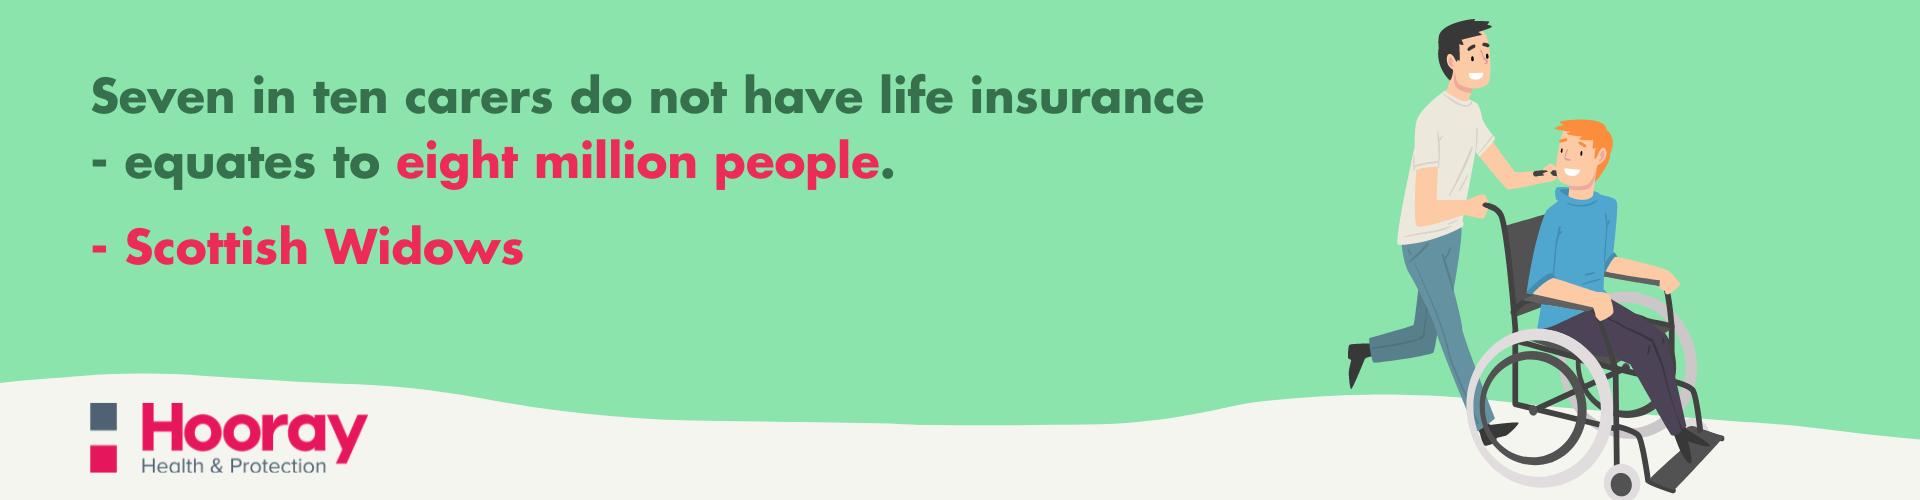 Life Insurance Carers